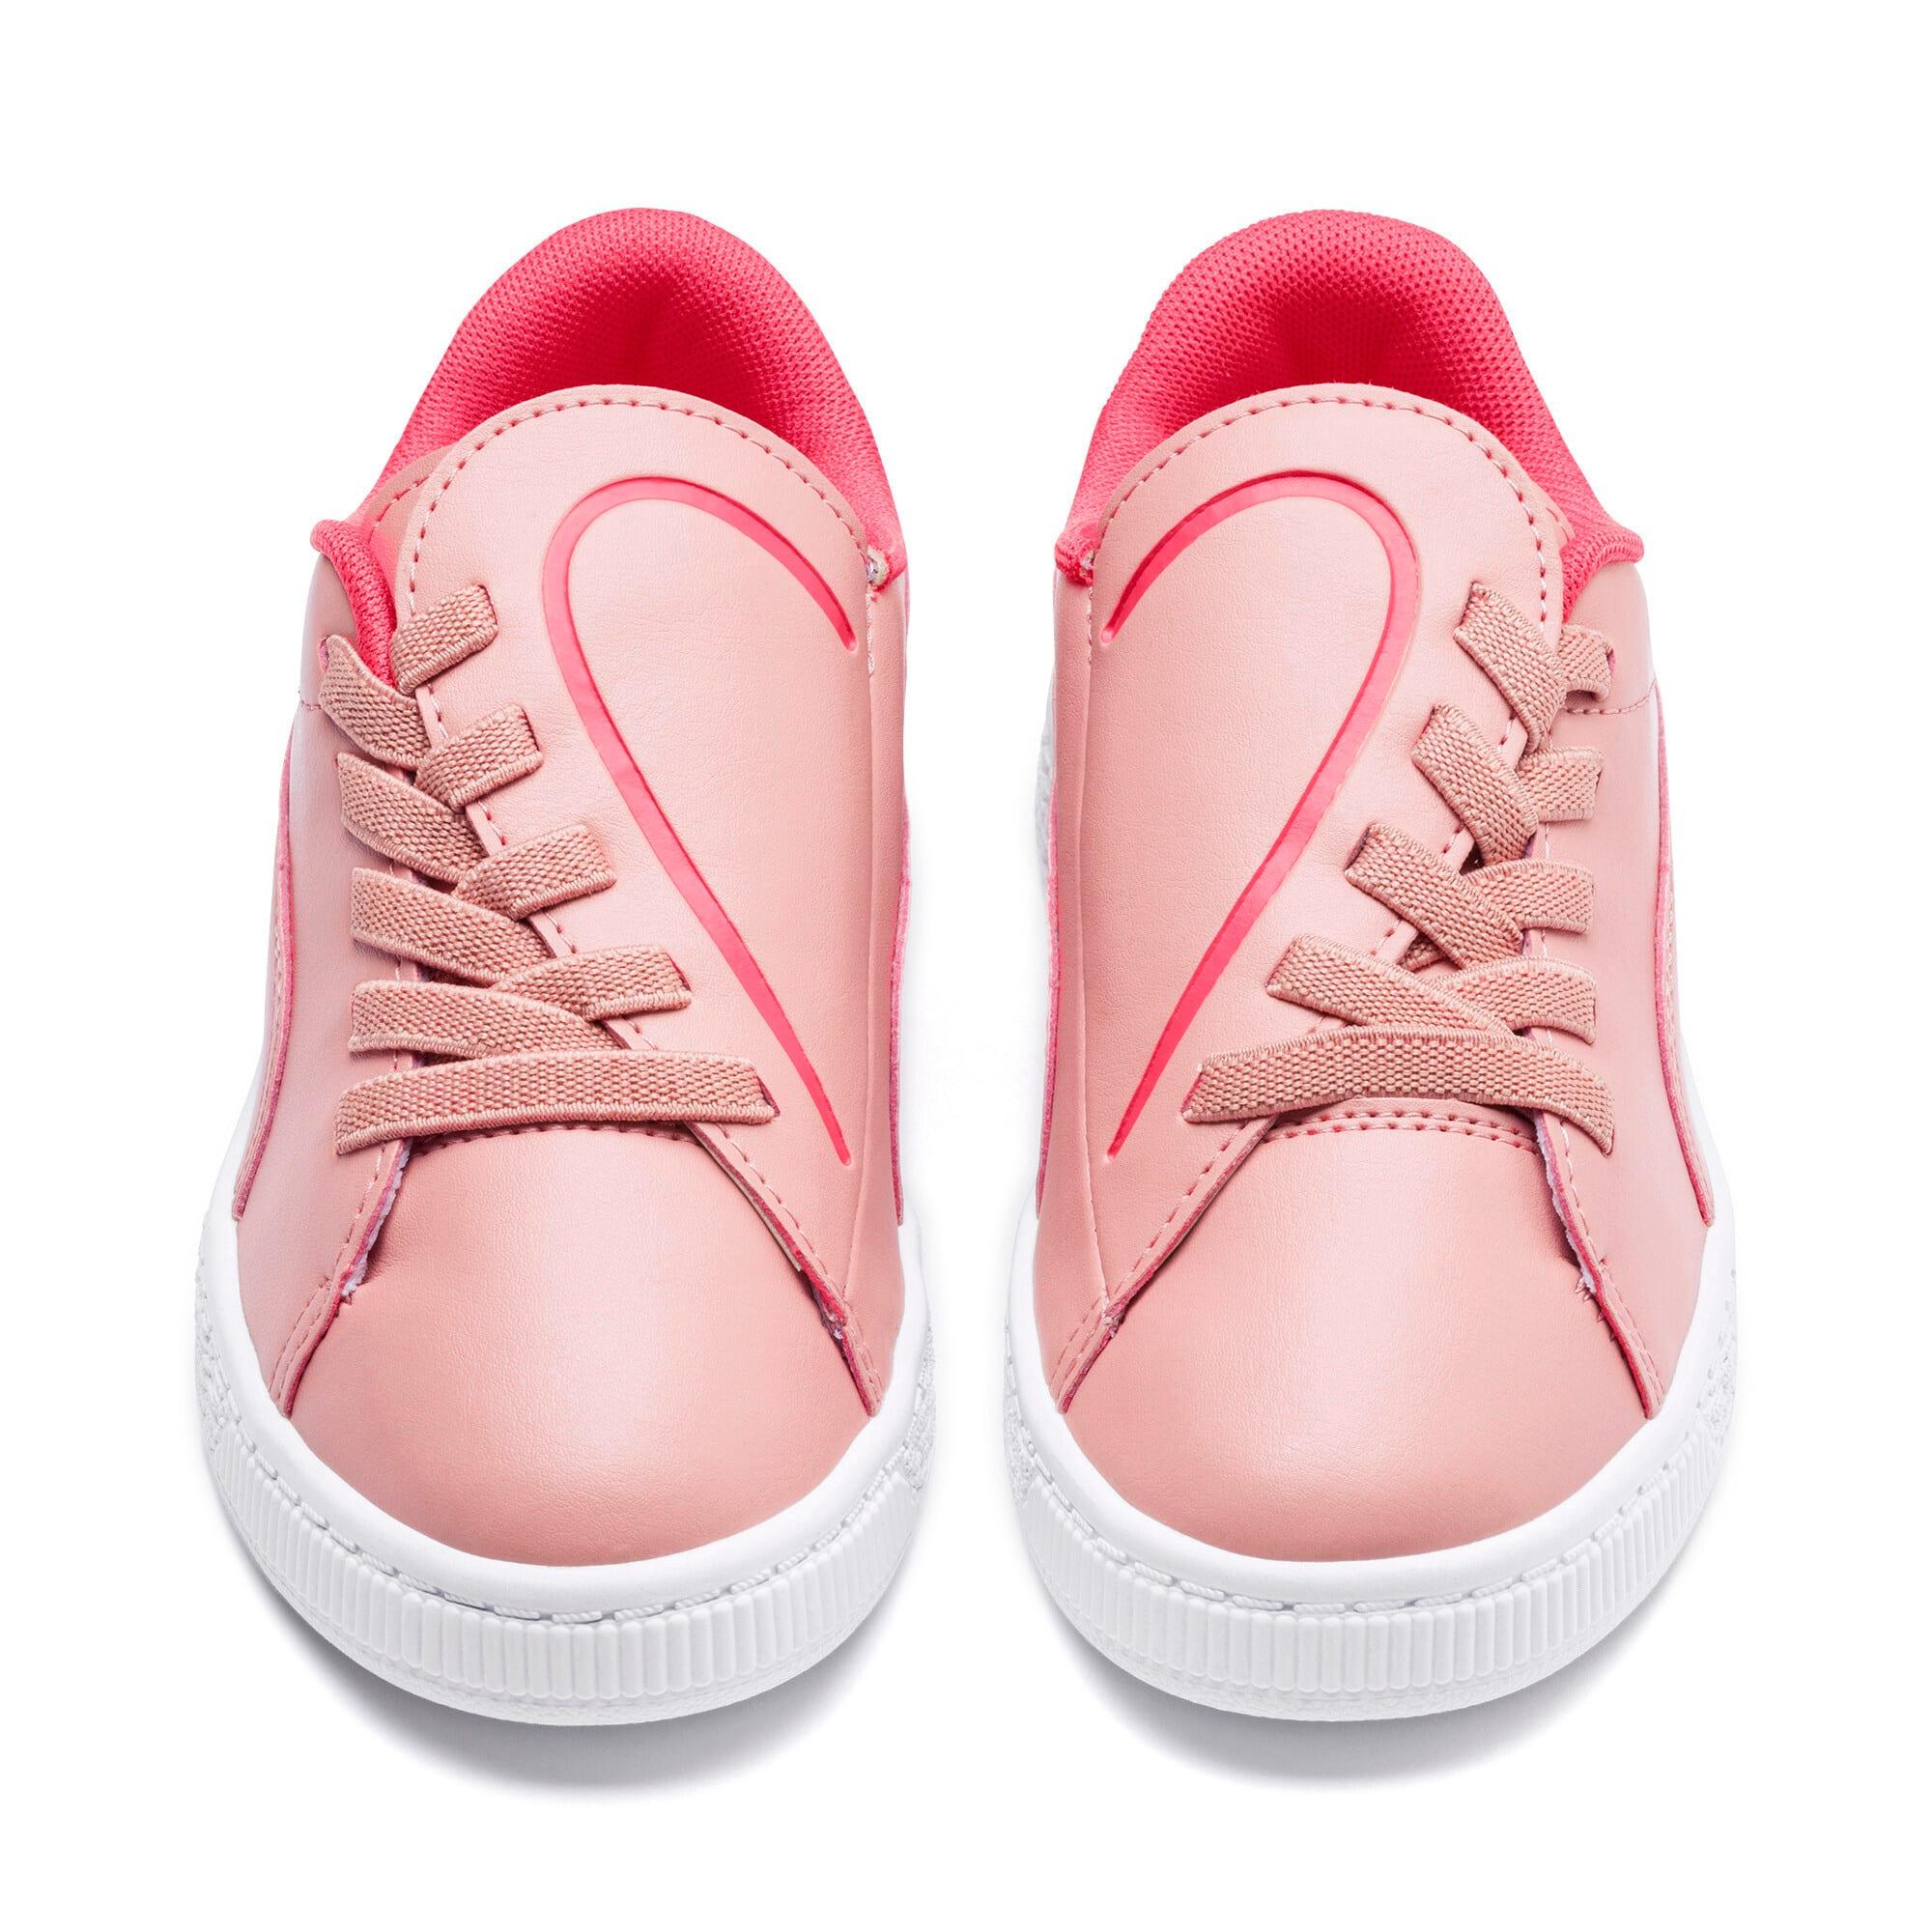 Thumbnail 7 of Basket Crush Kids' Trainers, Bridal Rose-Pink Alert, medium-IND